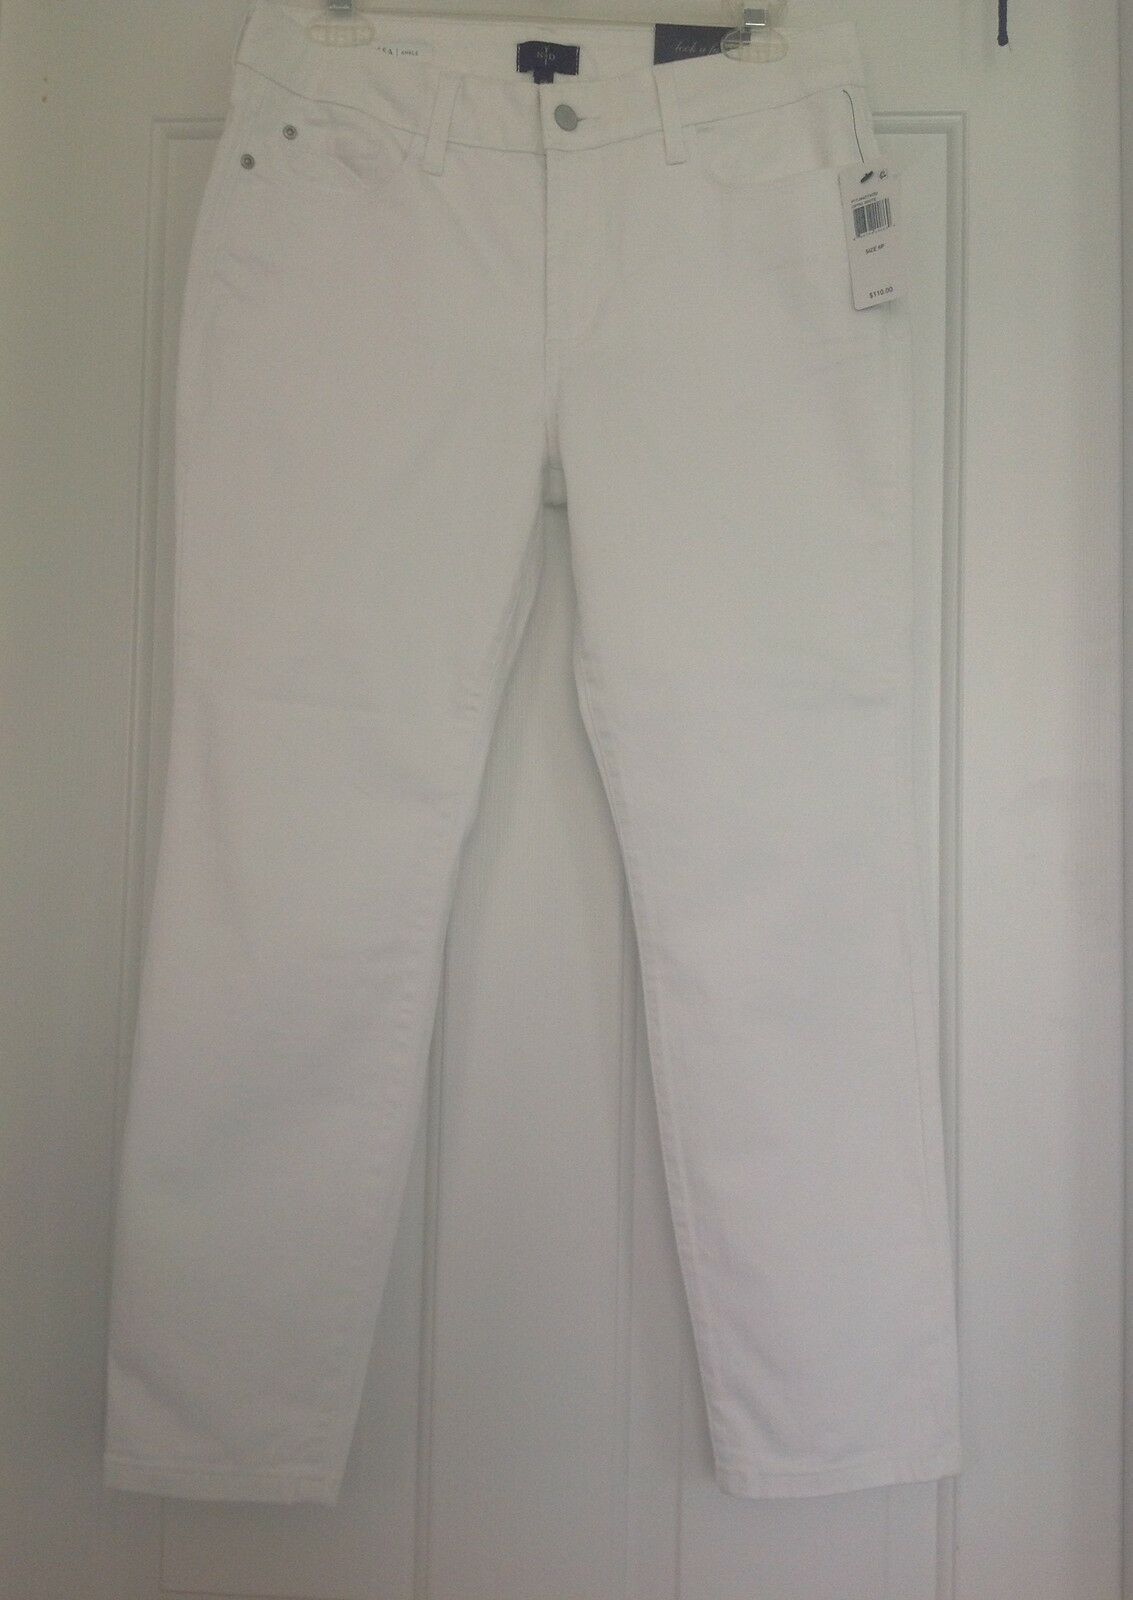 Denim skinny jeans White Cotton NYDJ Women's Ankle NWT Size 8 Petite